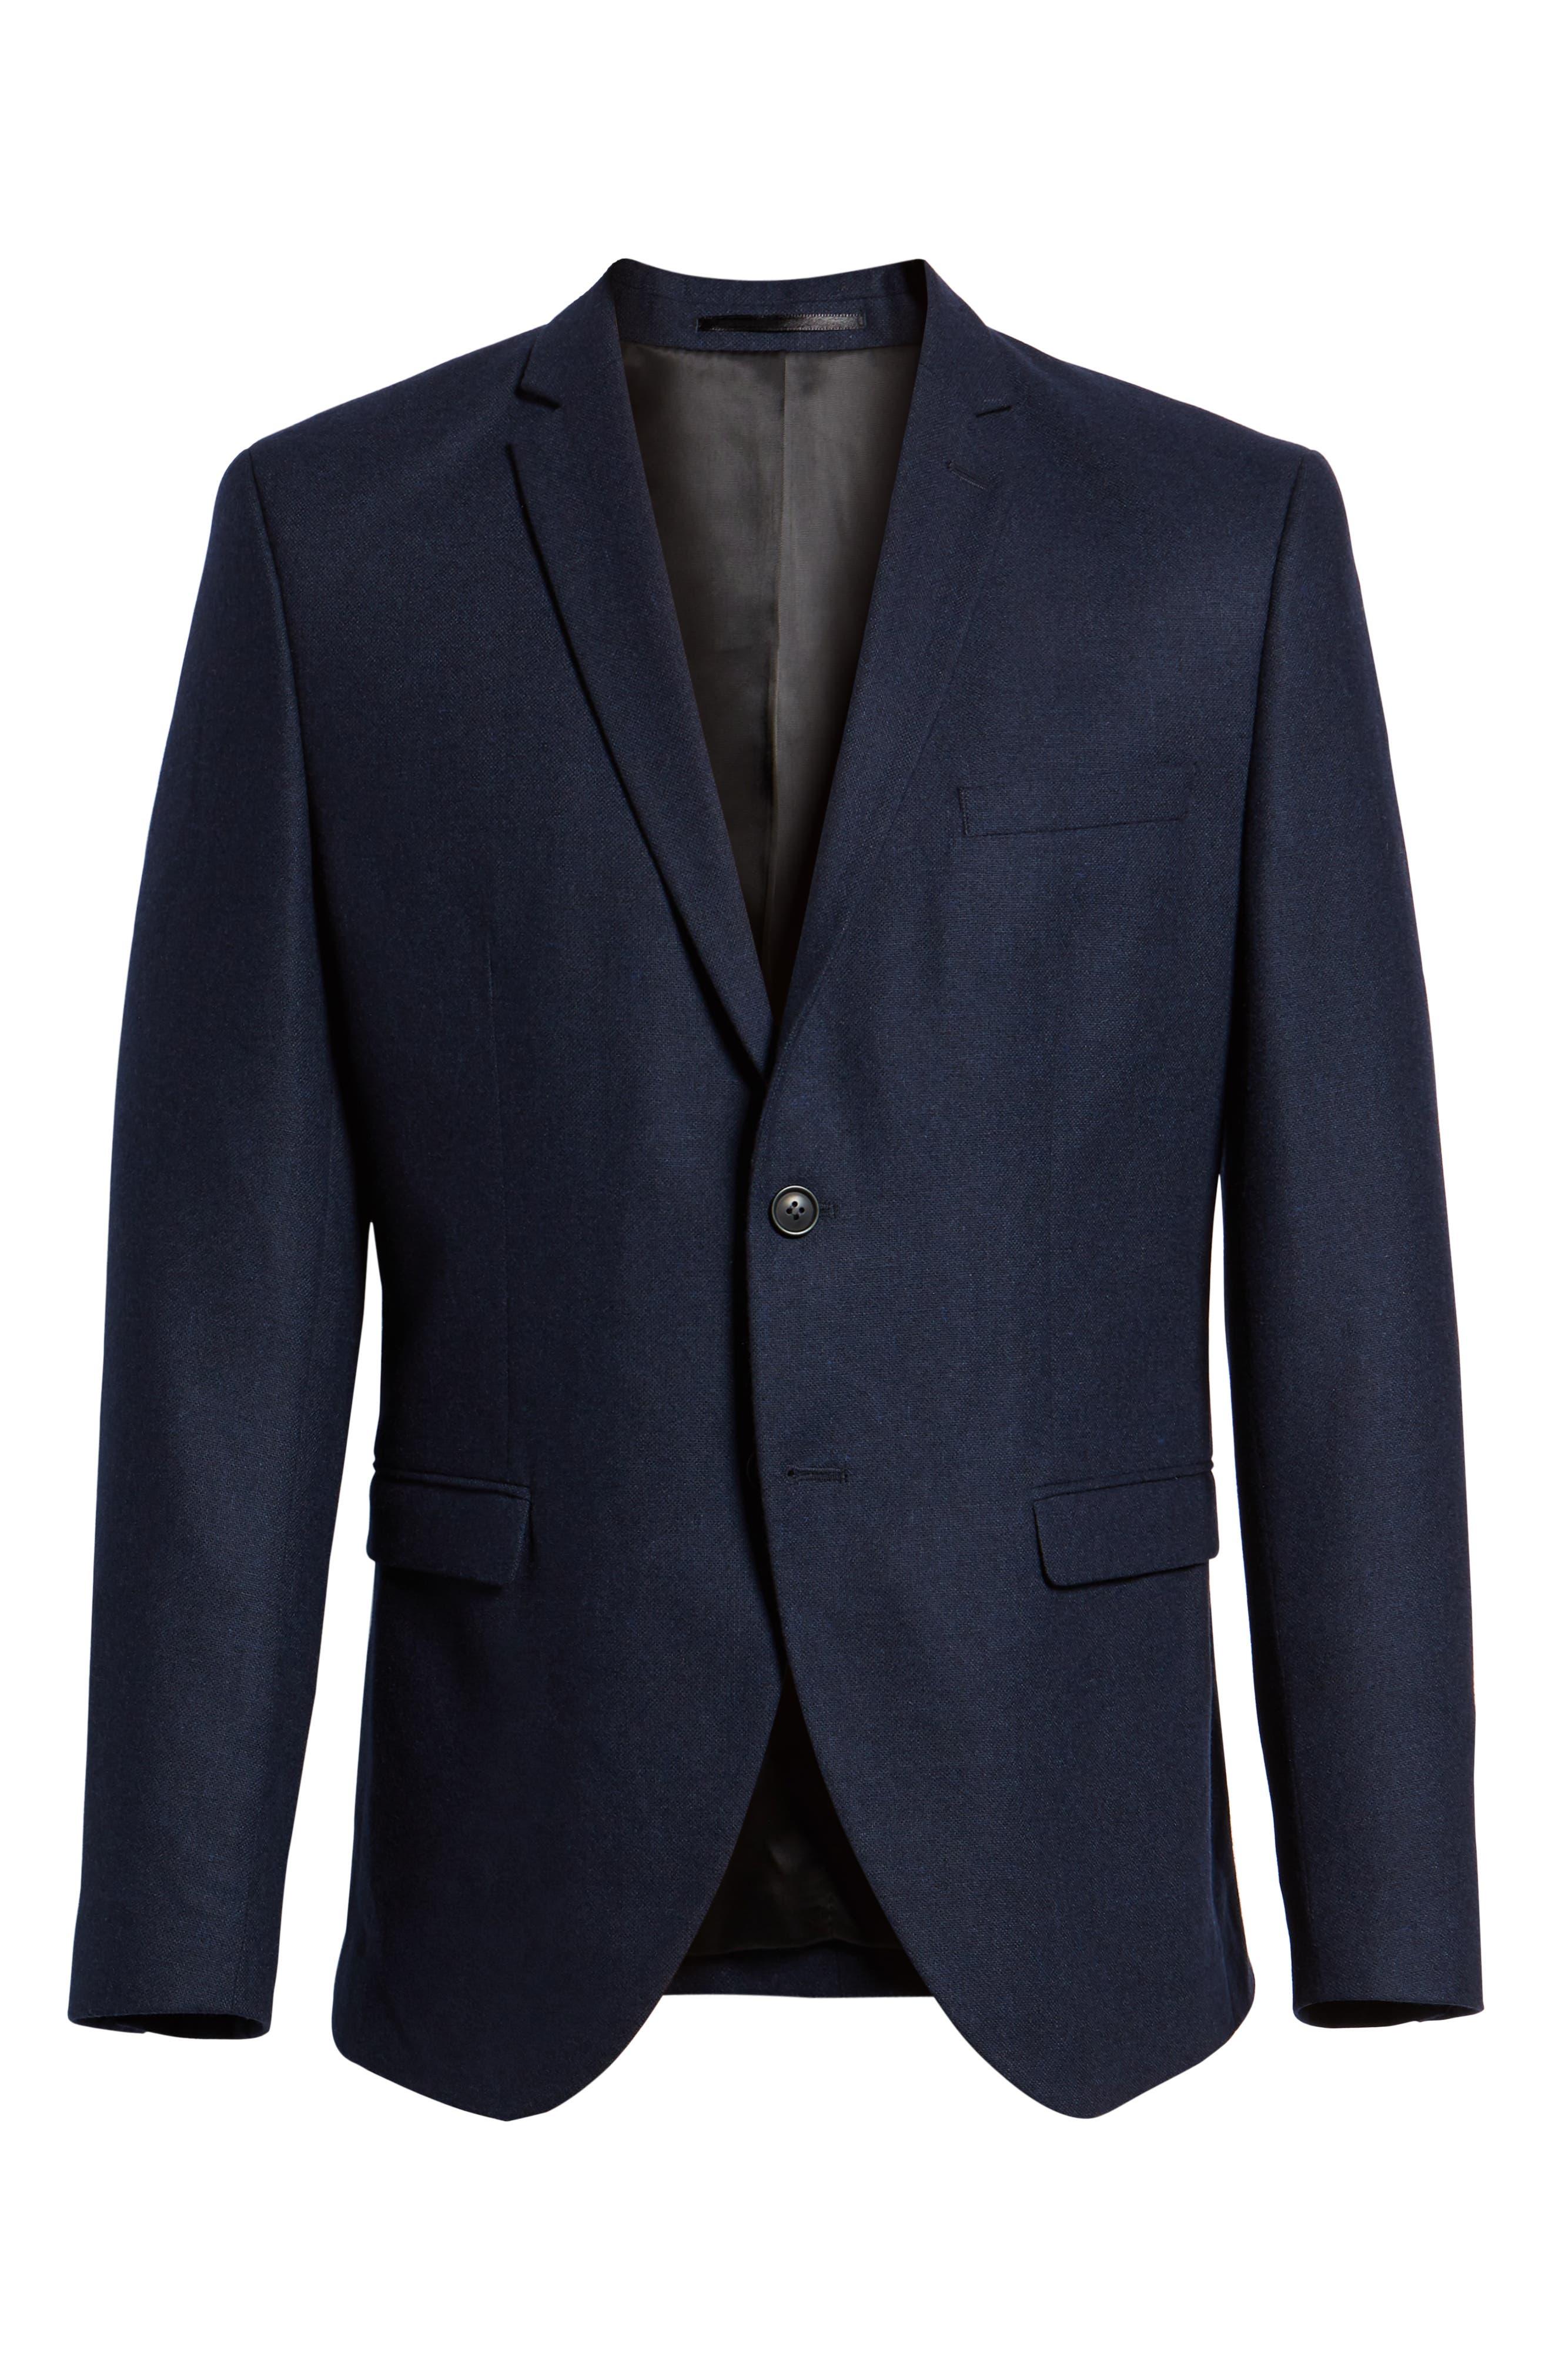 Myloiver Slim Fit Wool Blend Blazer,                             Alternate thumbnail 5, color,                             DARK NAVY